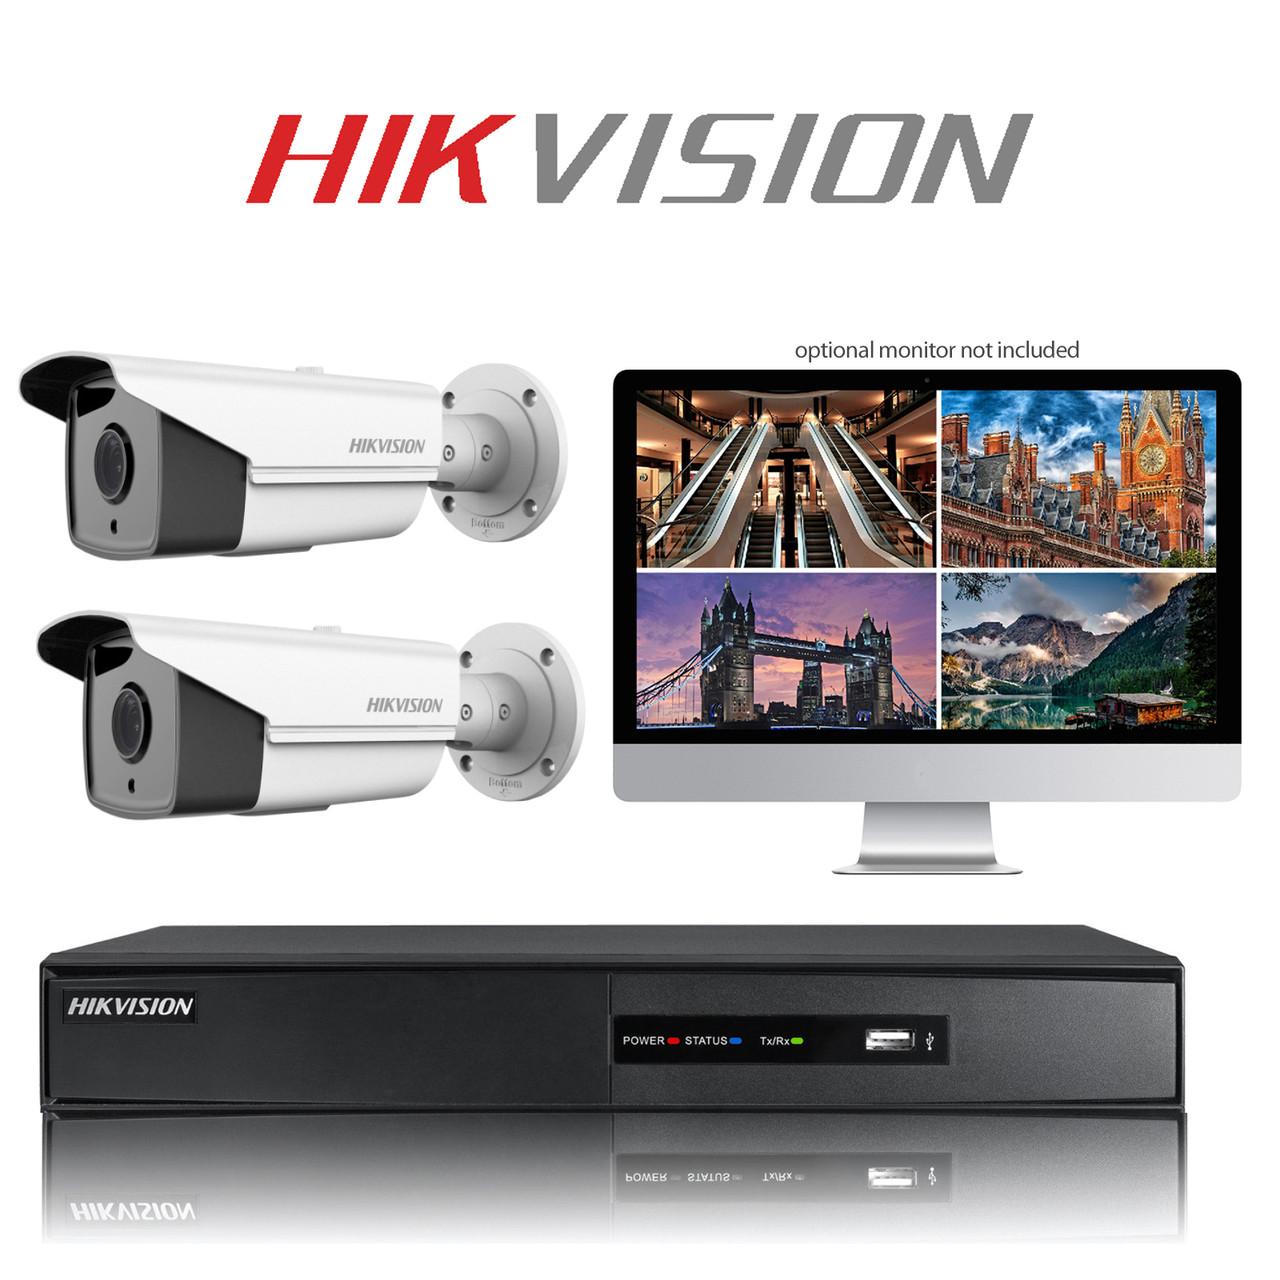 2 Hikvision TurboHD CCTV Bullet camera kit FULL HD DVR